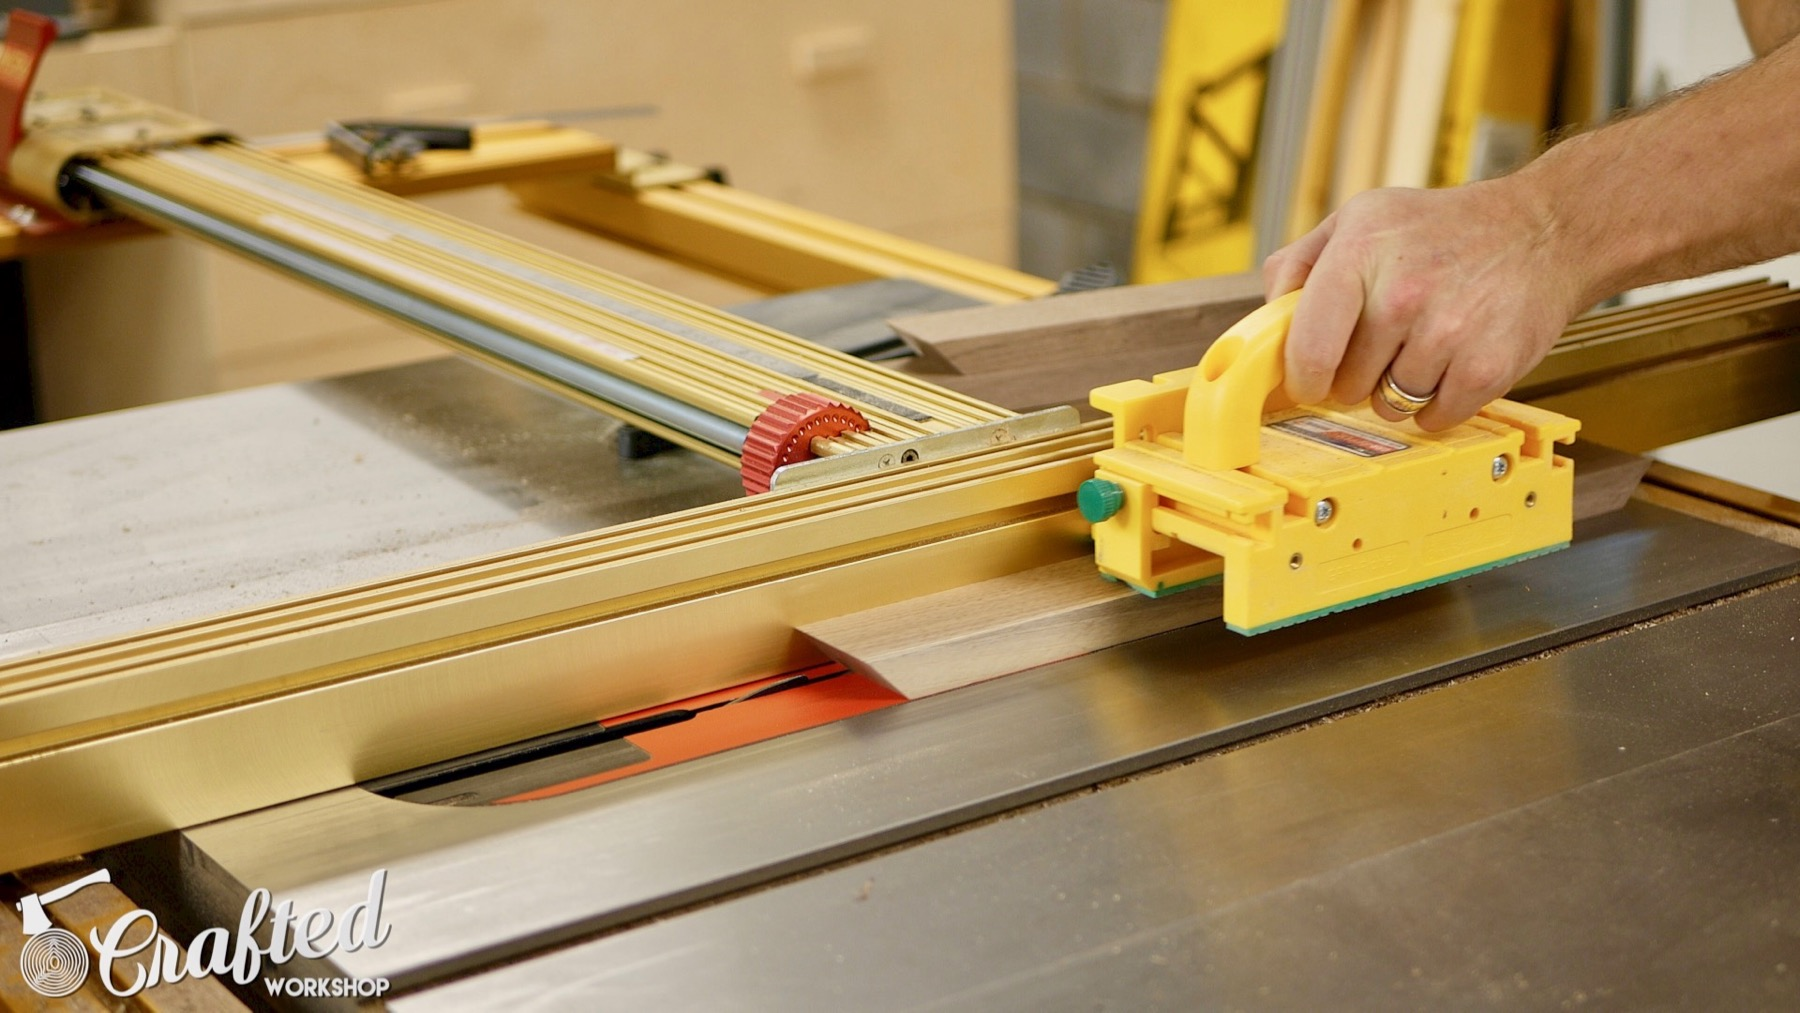 DIY Light Box Sign How-To Build sawstop pcs table saw